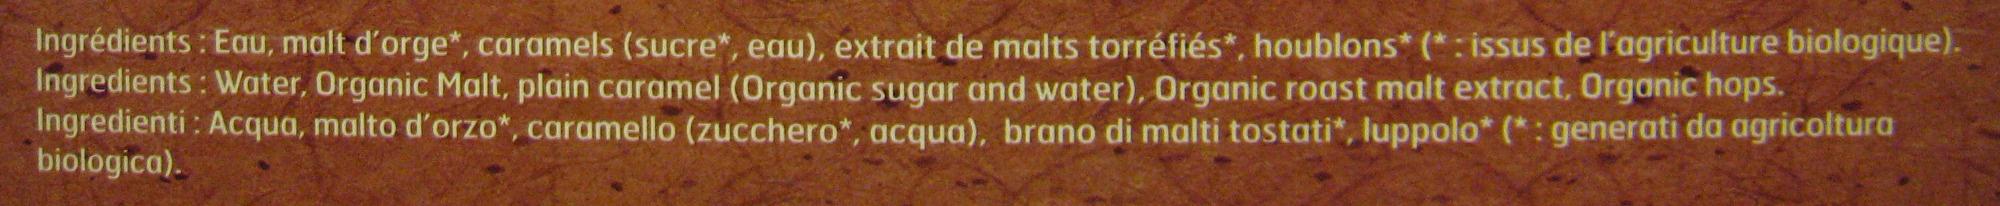 Bière ambrée malt bio Jade - Ingrediënten